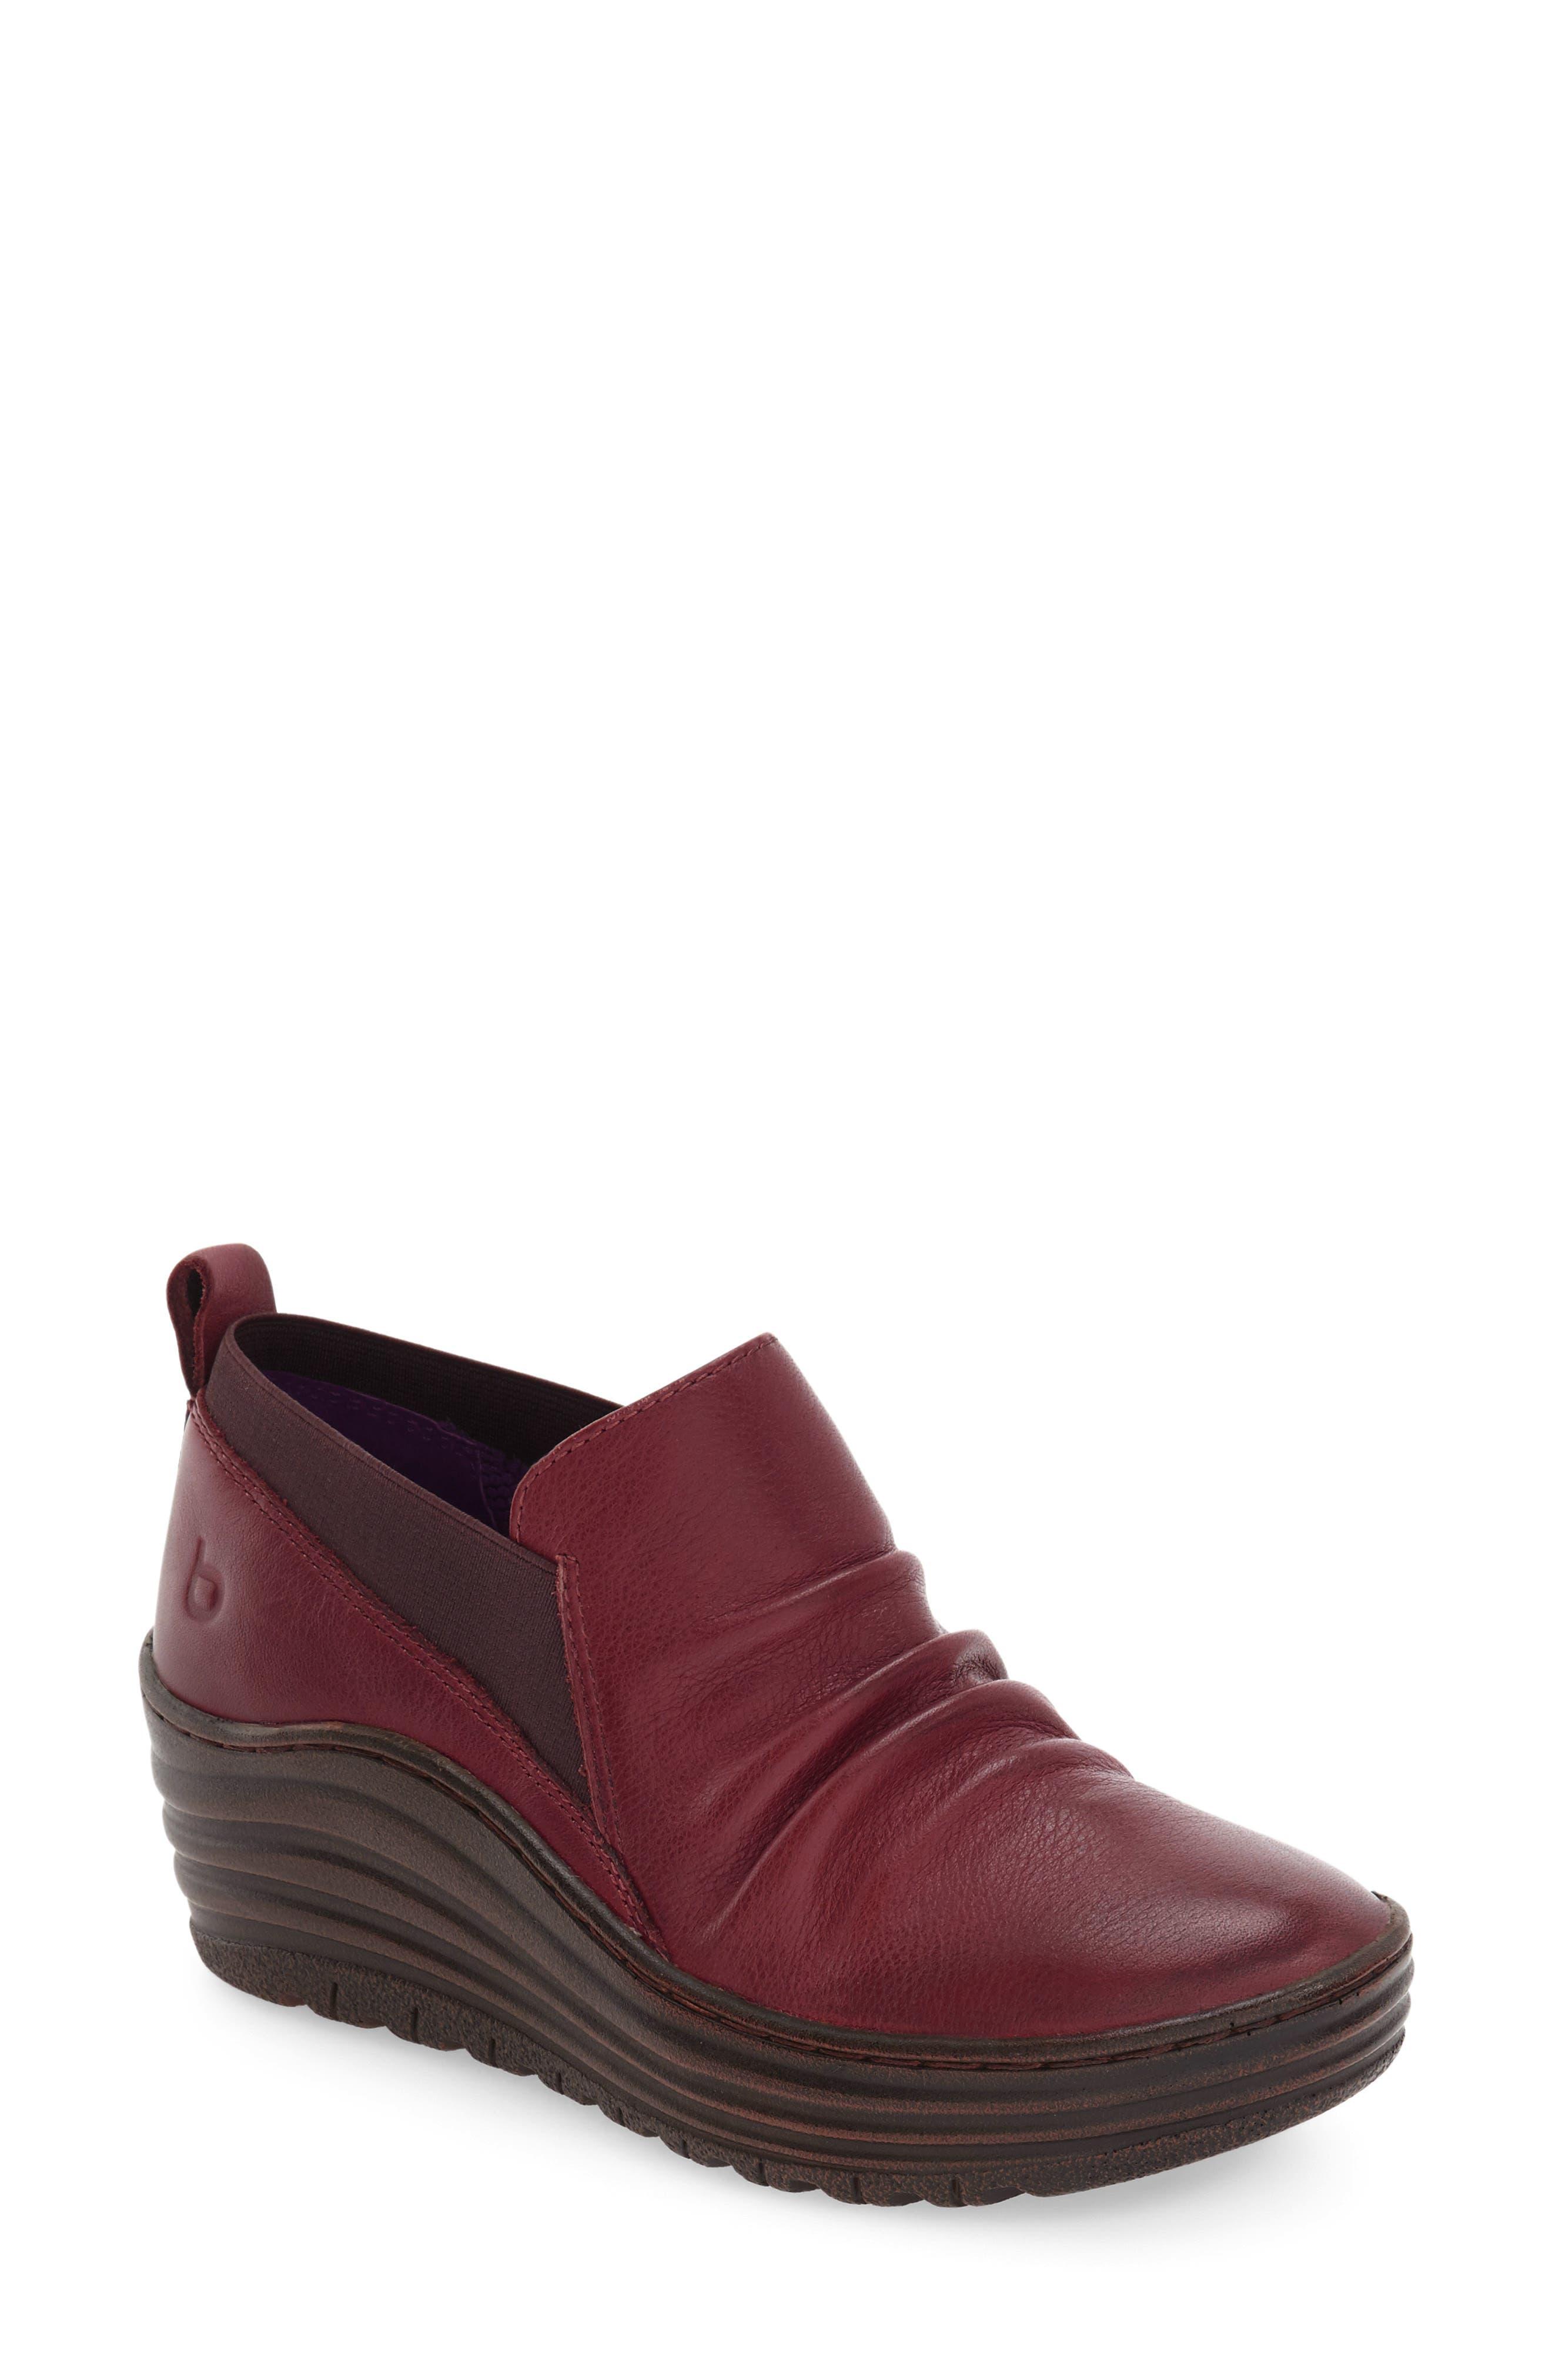 bionica 'Gallant' Leather Bootie (Women)